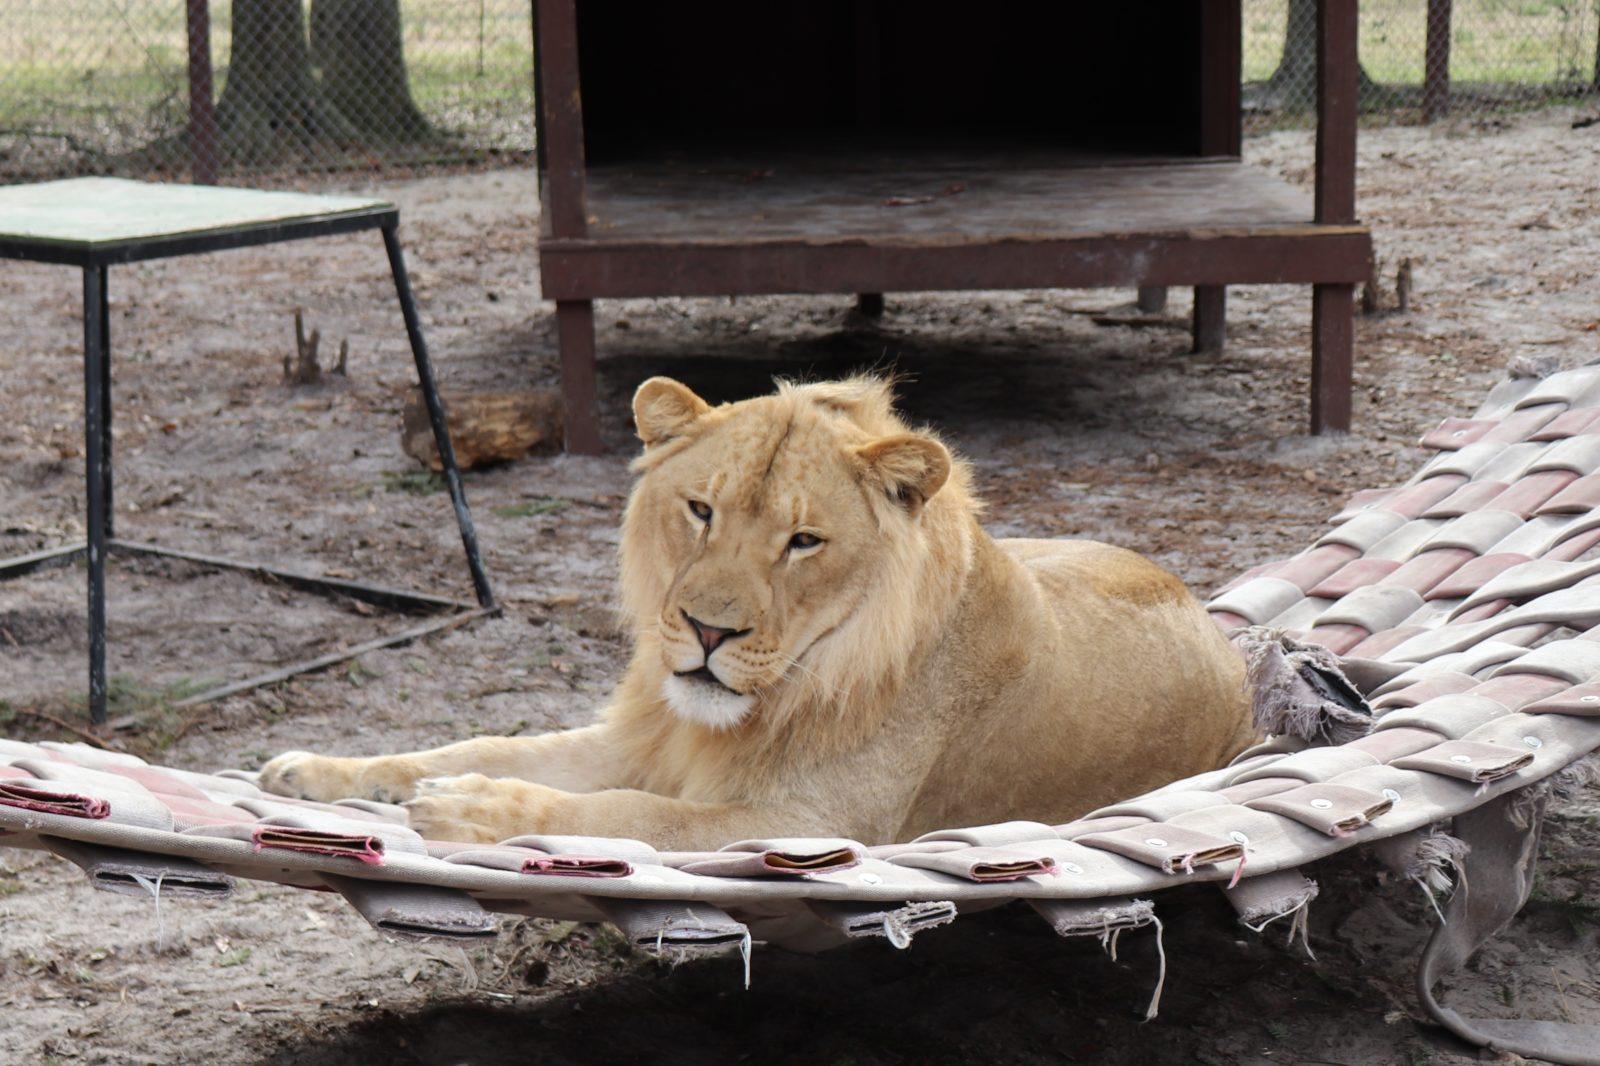 lion on a hammock